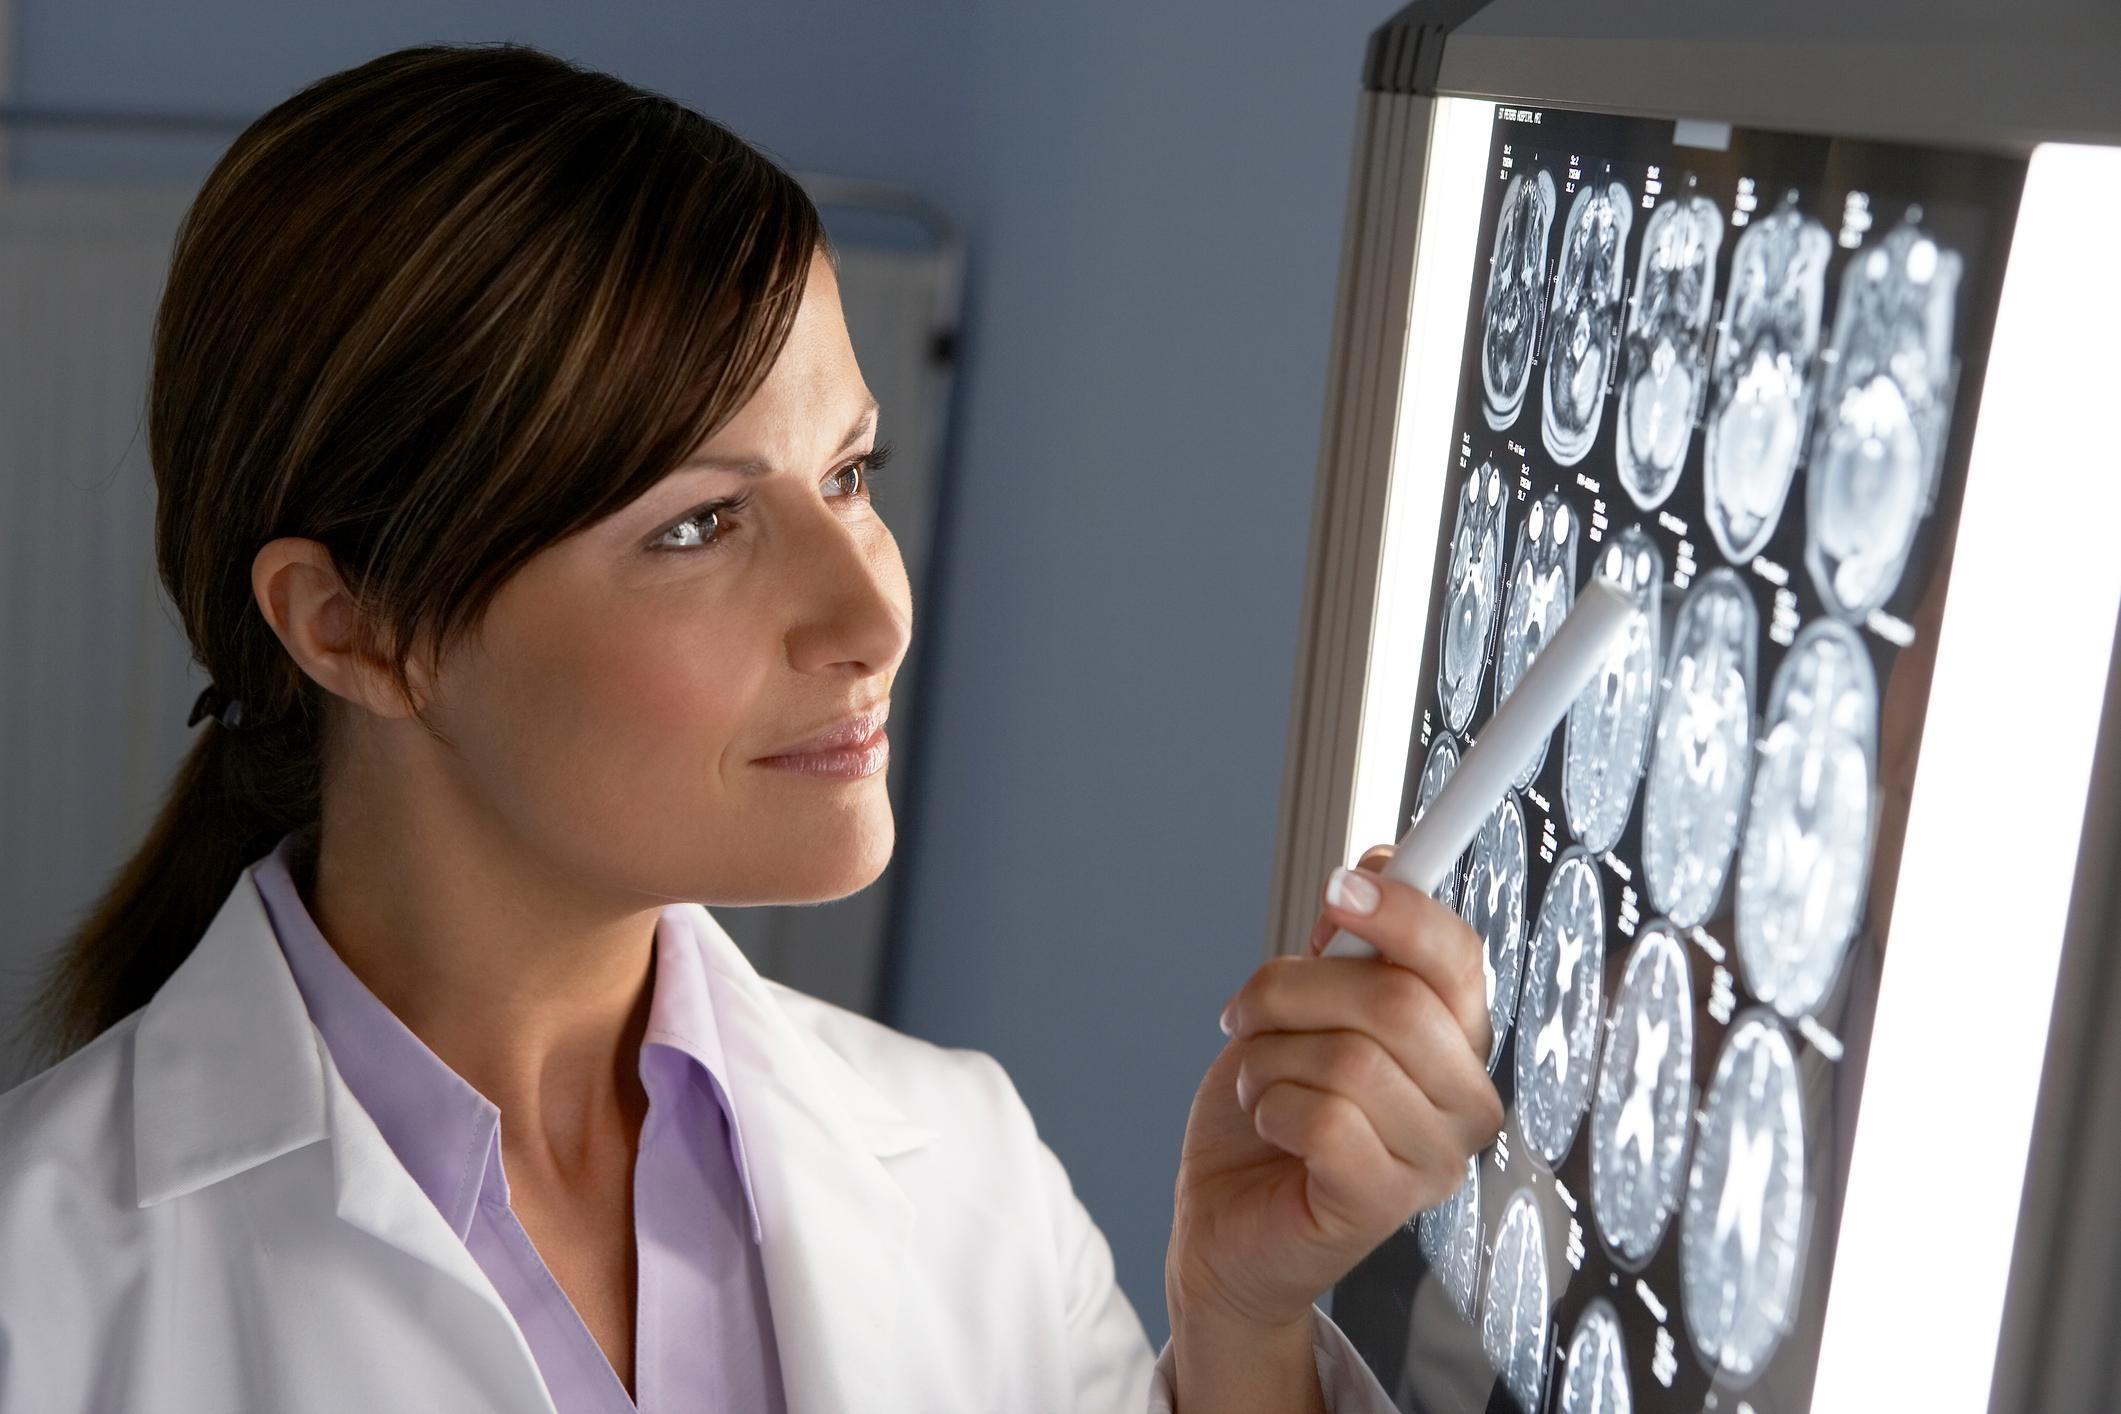 Metformin Cancer Risk